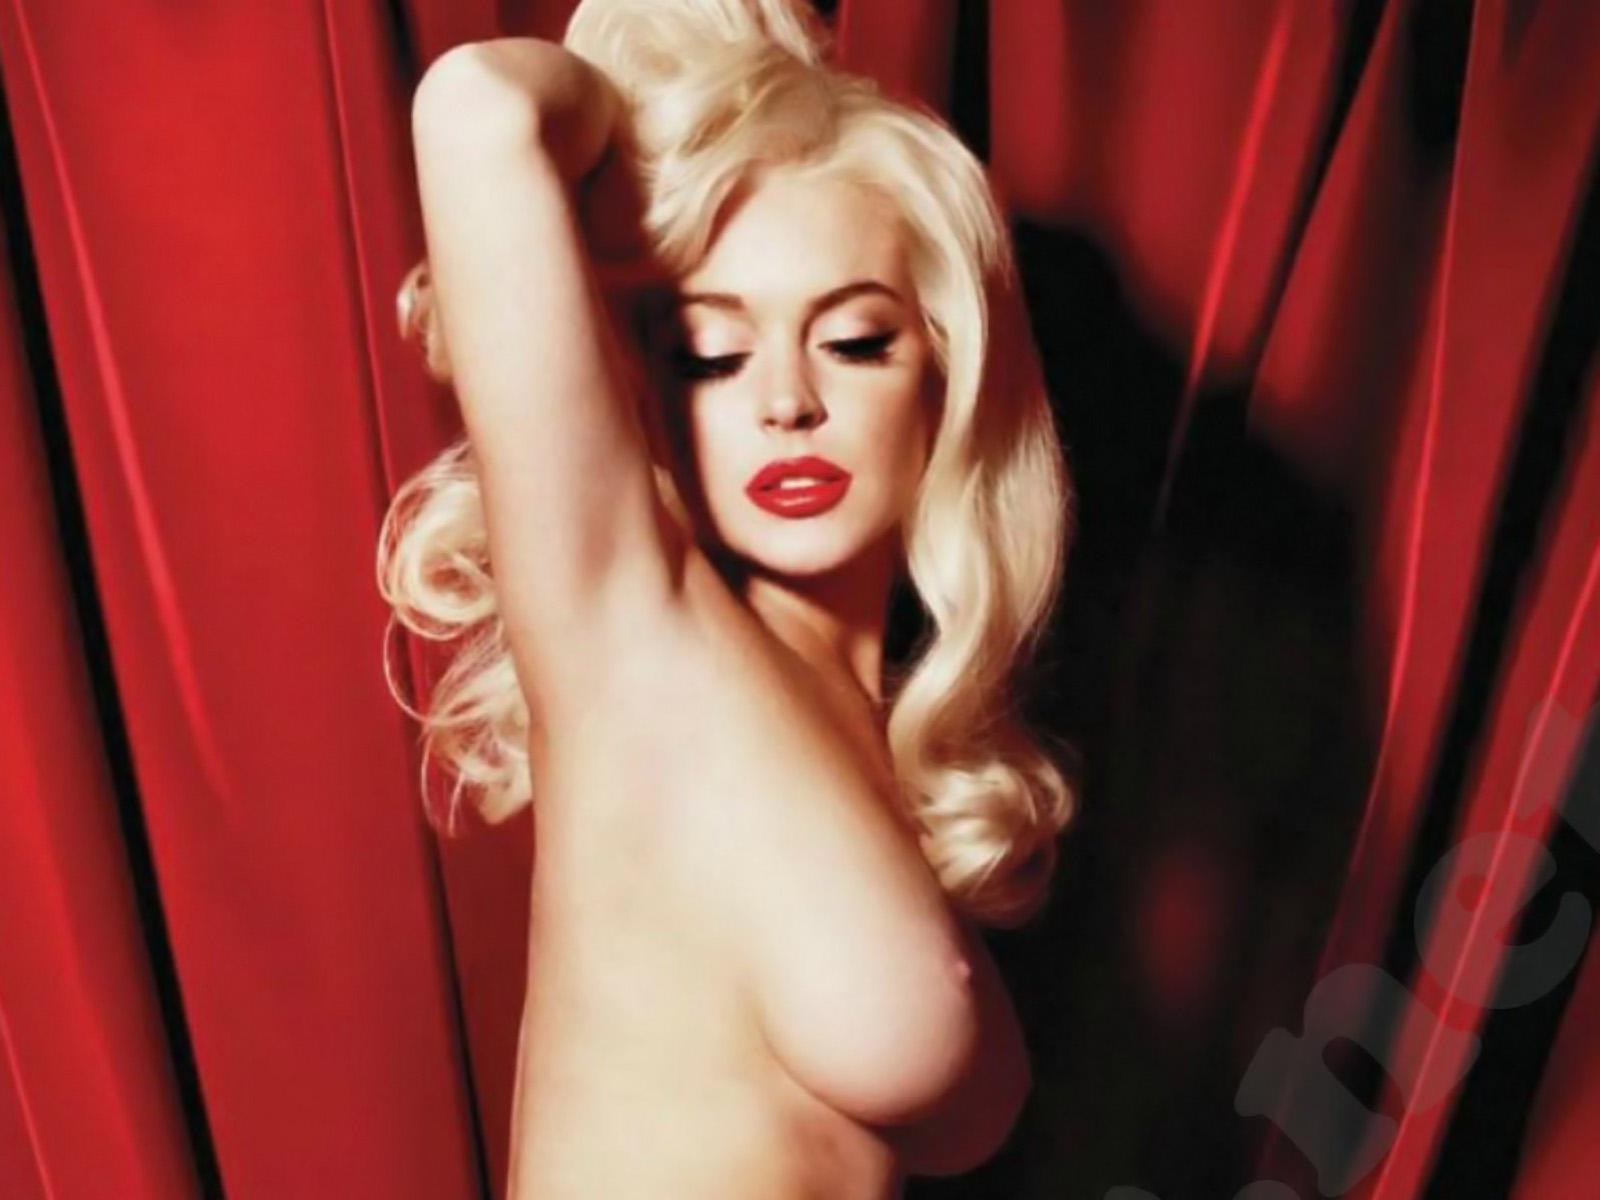 Classic Lindsay Lohan SNL Caps 2013 - 20 Pics - xHamstercom